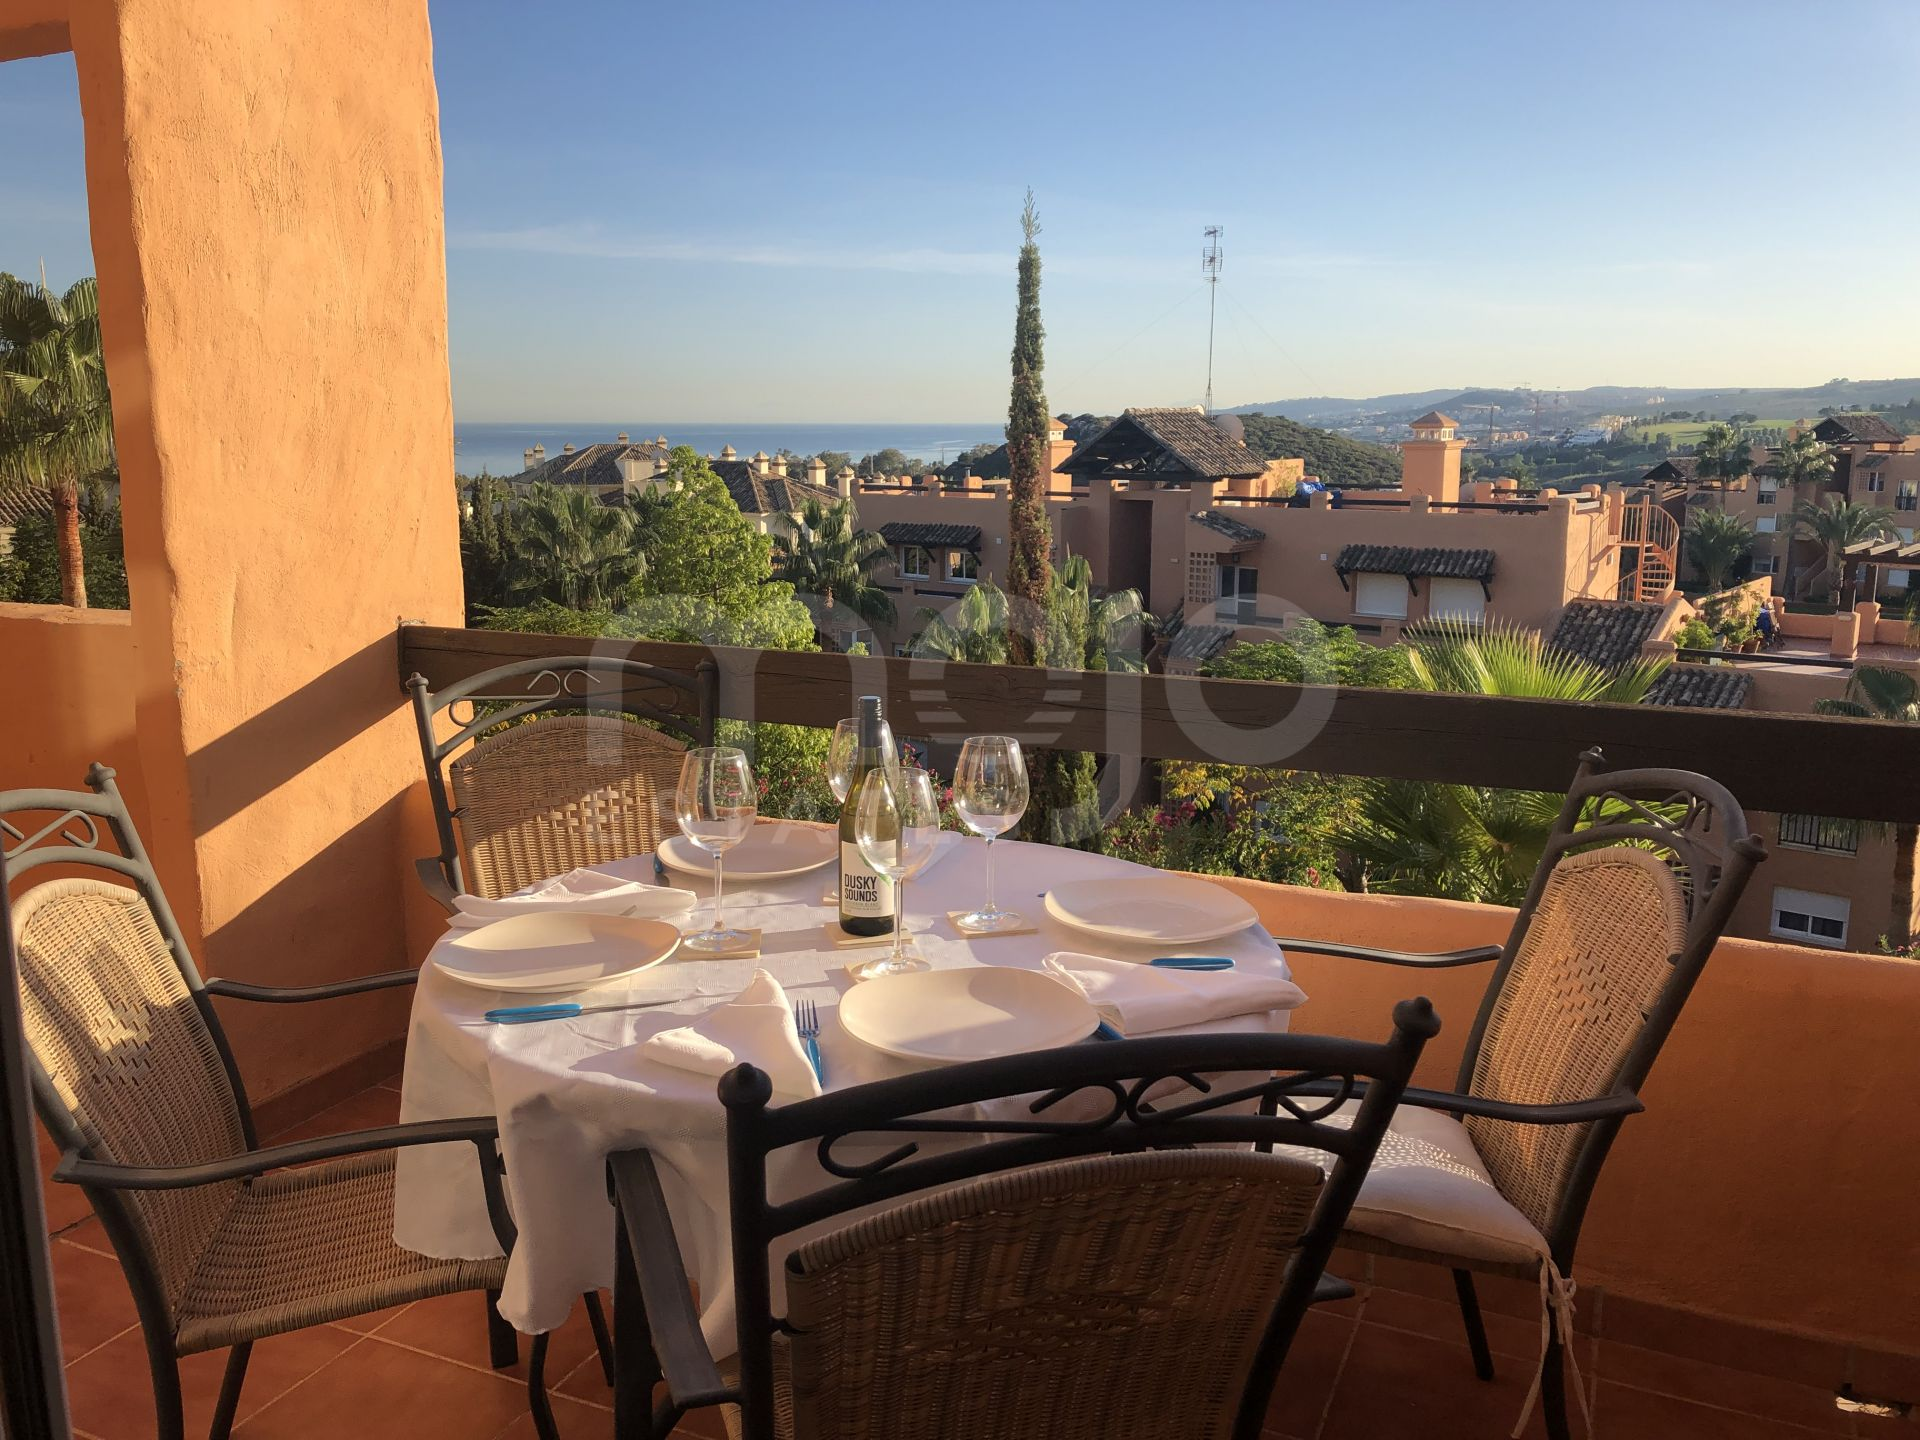 Duplex 2 bedroom Penthouse with Impressive Panoramic Views in Casares del sol, Casares Costa